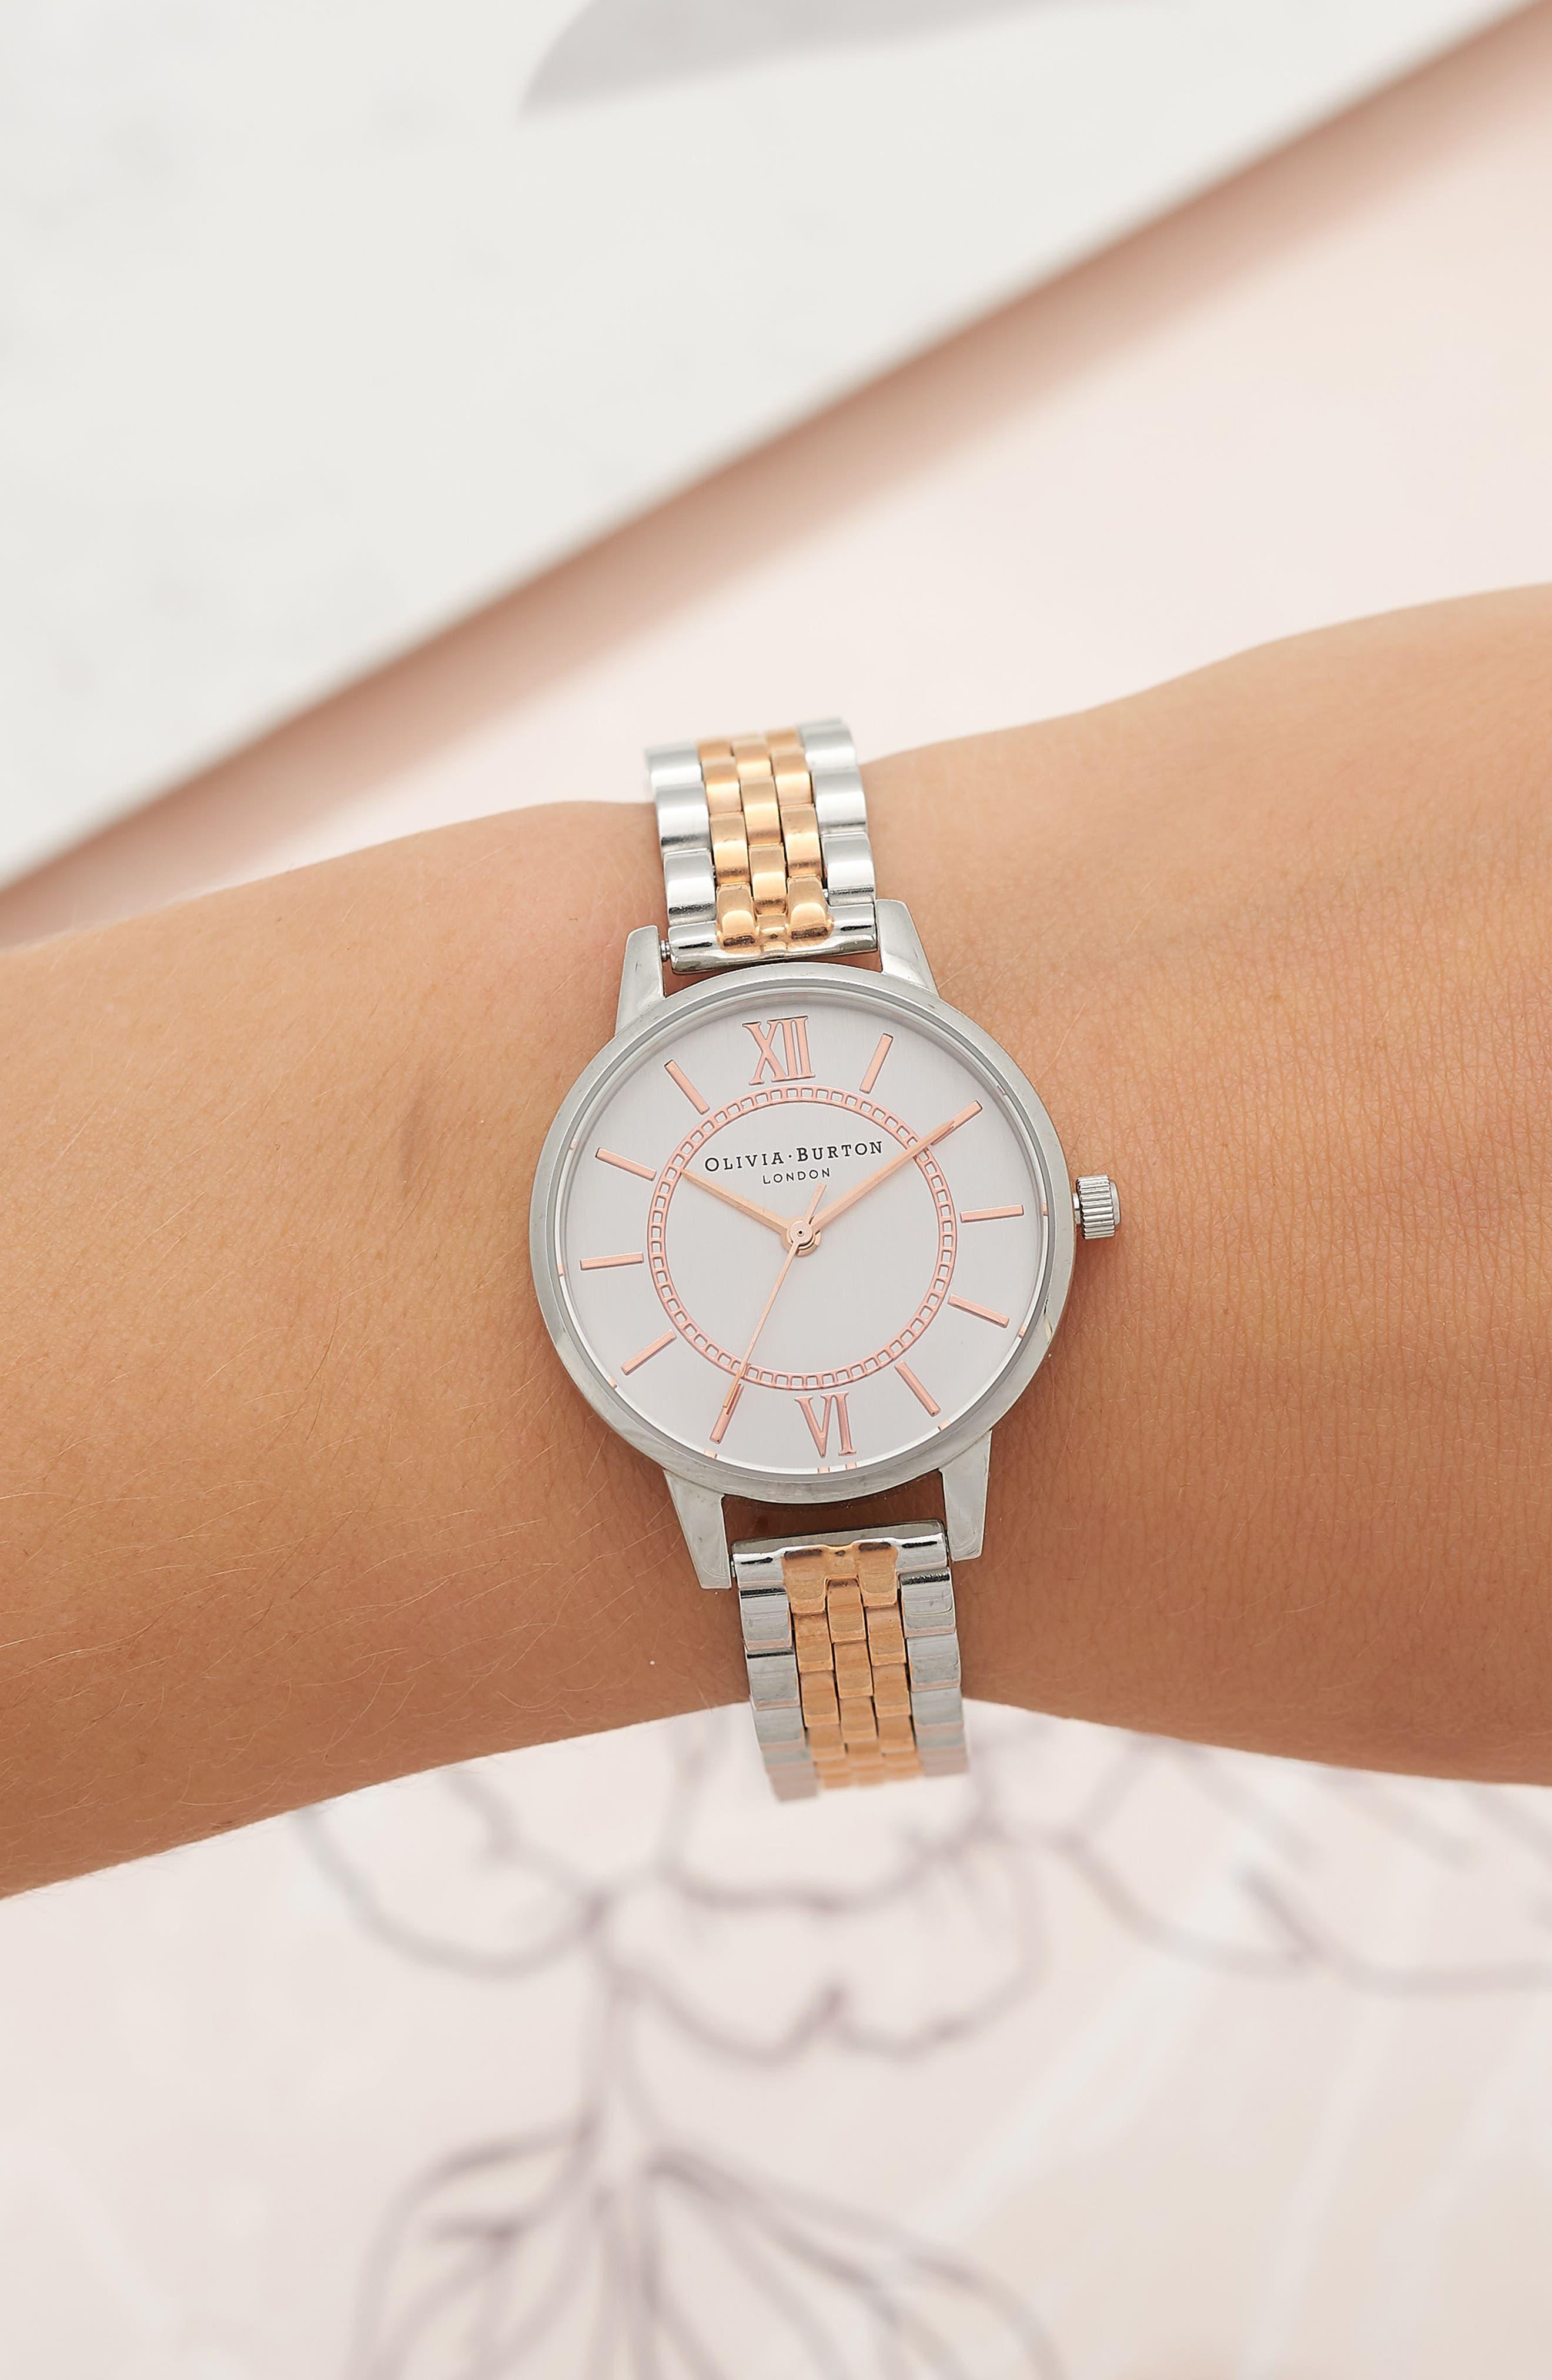 OLIVIA BURTON, Wonderland Bracelet Watch, 30mm, Alternate thumbnail 2, color, ROSE GOLD/ SILVER